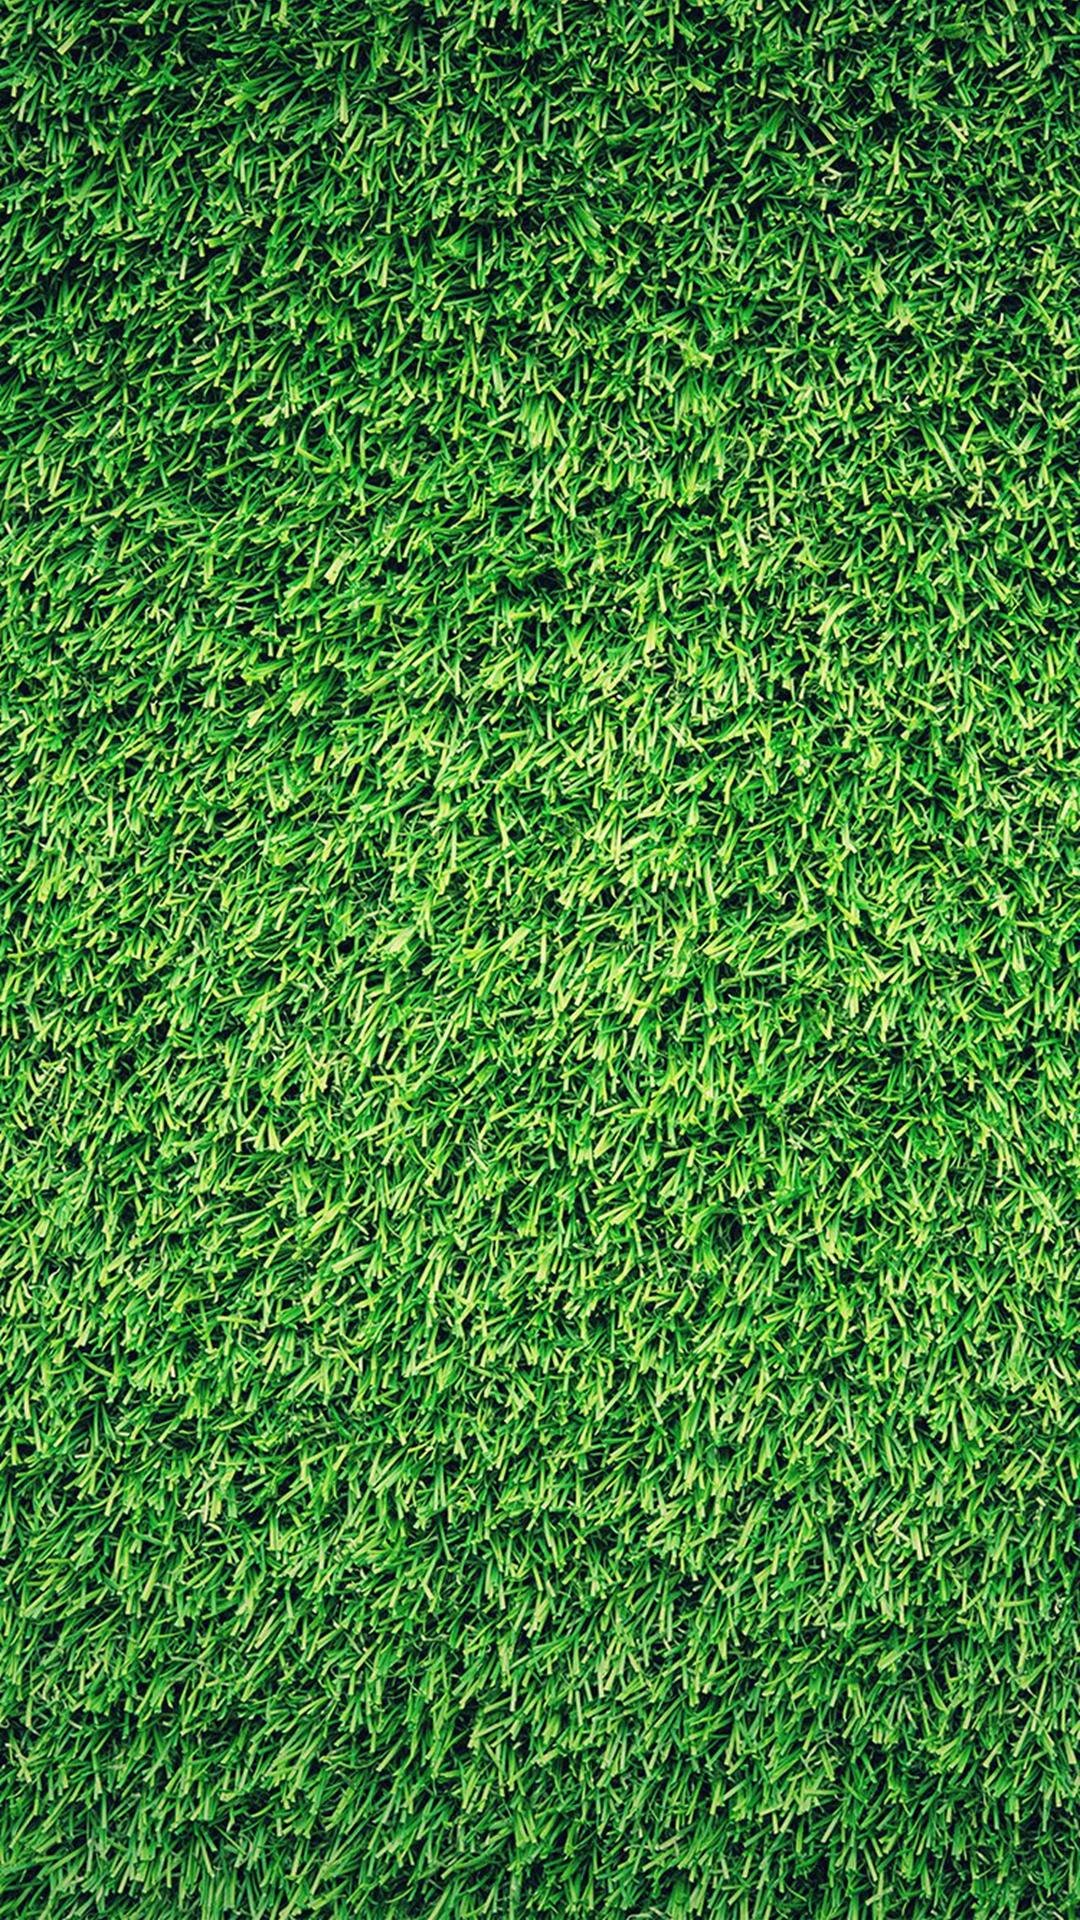 Grass-Green-Pattern-Nature-iPhone-plus-wallpaper-wallpaper-wp4806944